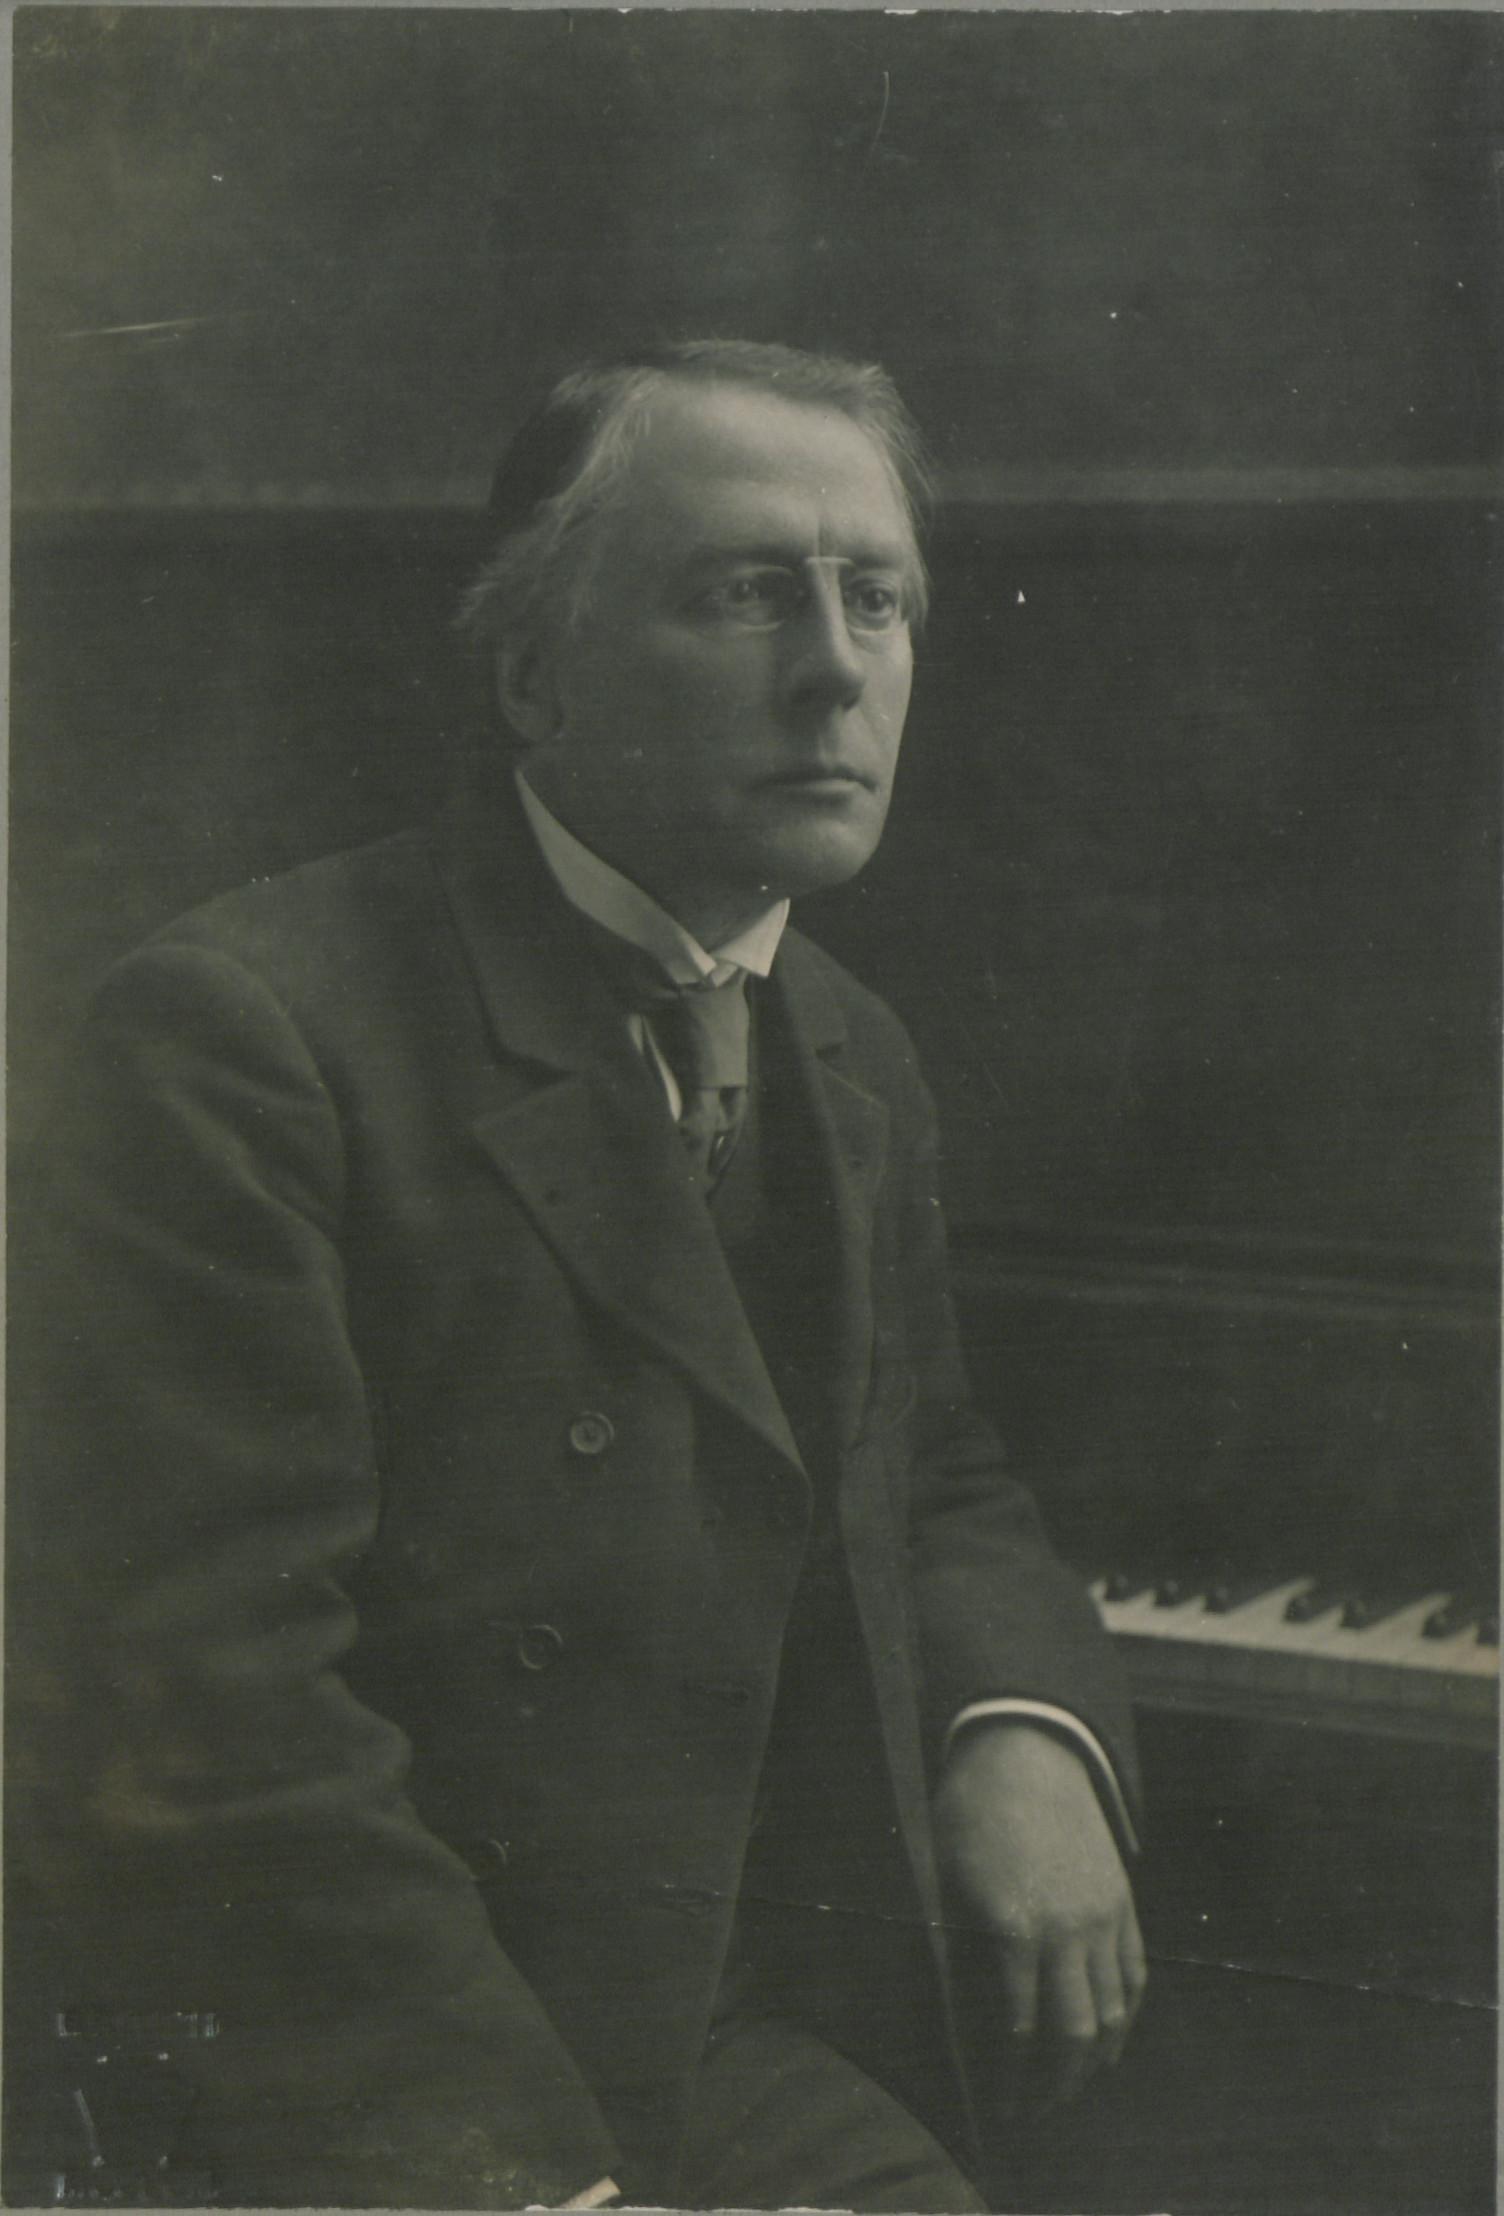 Arthur Friedheim, 1912